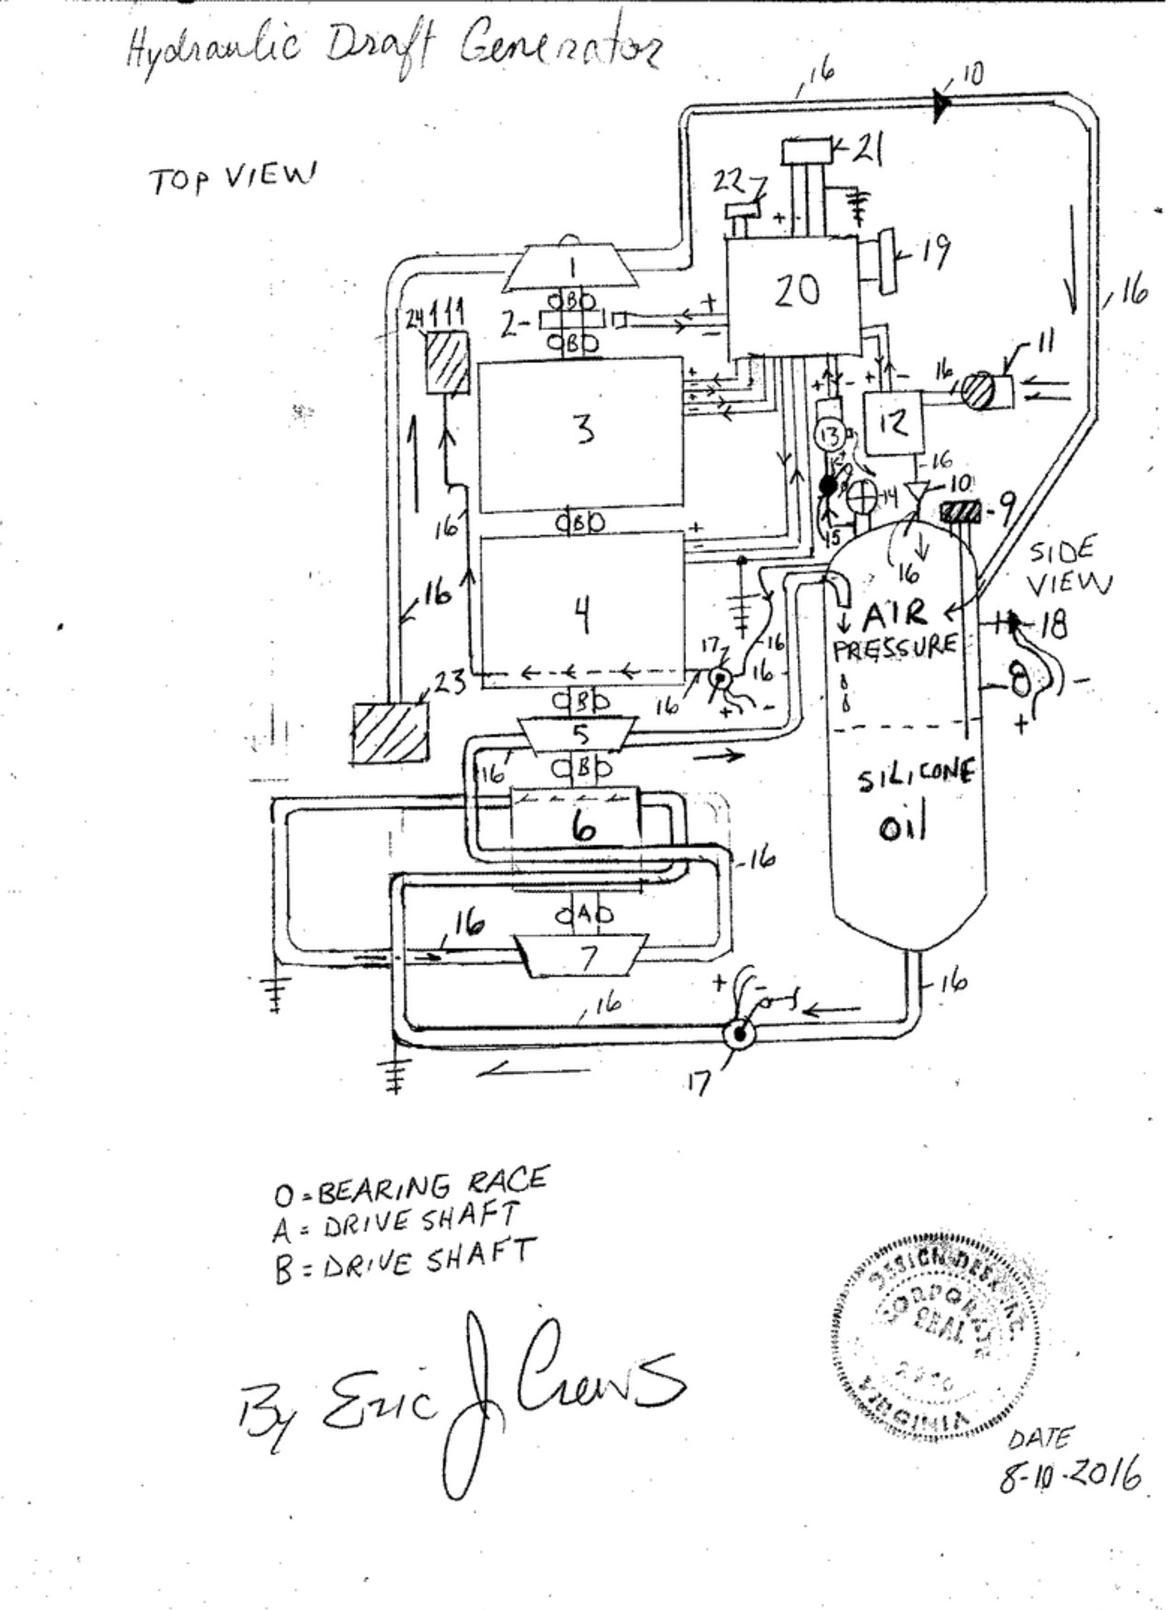 http://designdeskinc.com/Hydraulic_Draft_Cycle.html